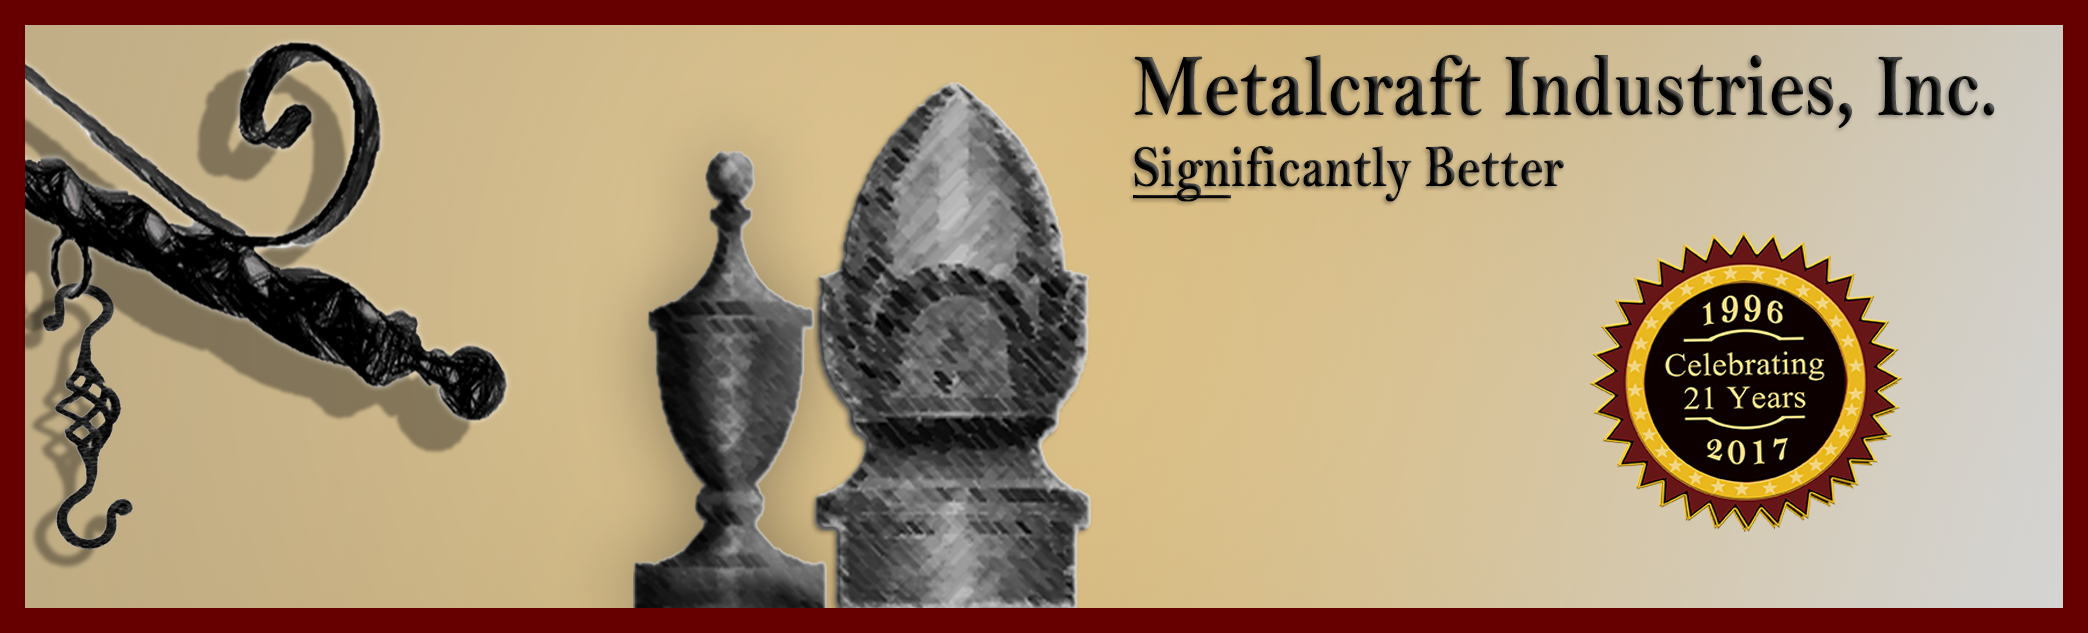 Metalcraft Industries